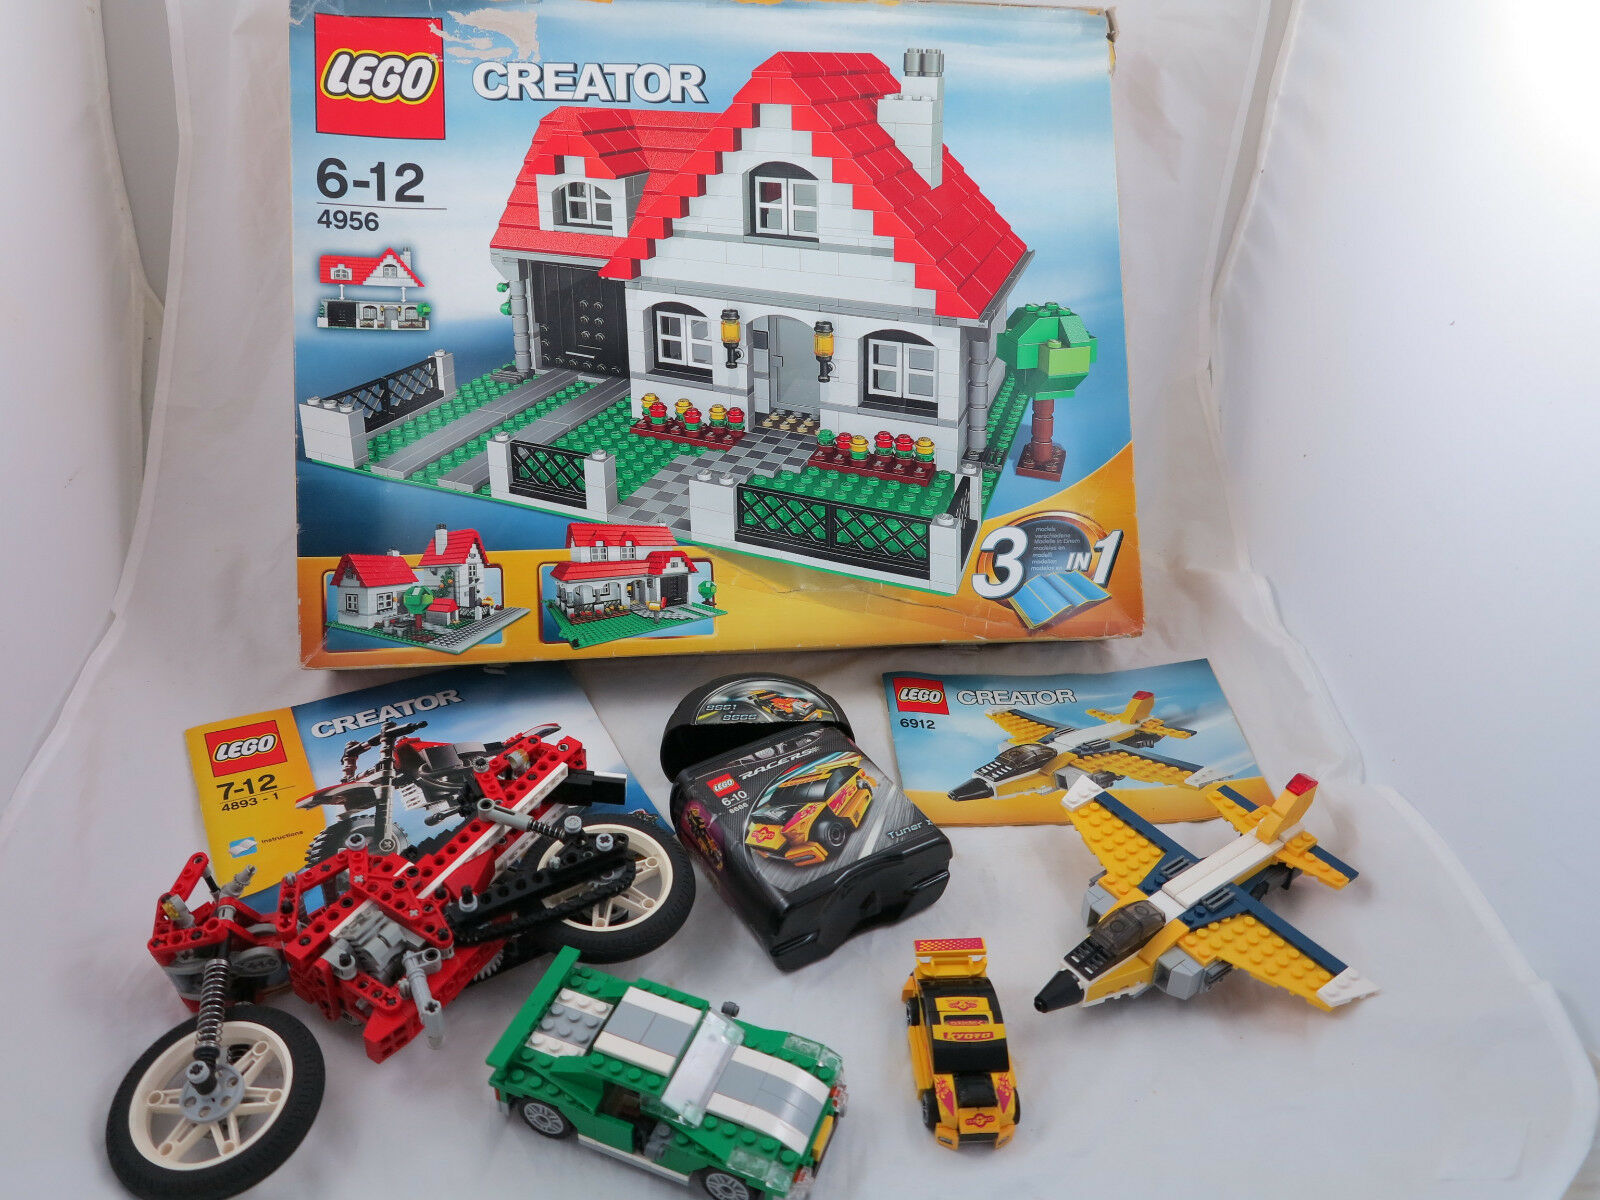 LEGO CREATOR 4956 6912 8866 4893 Haus,Auto,Motorrad uvm Konvolut +OVP+OBA( 117)